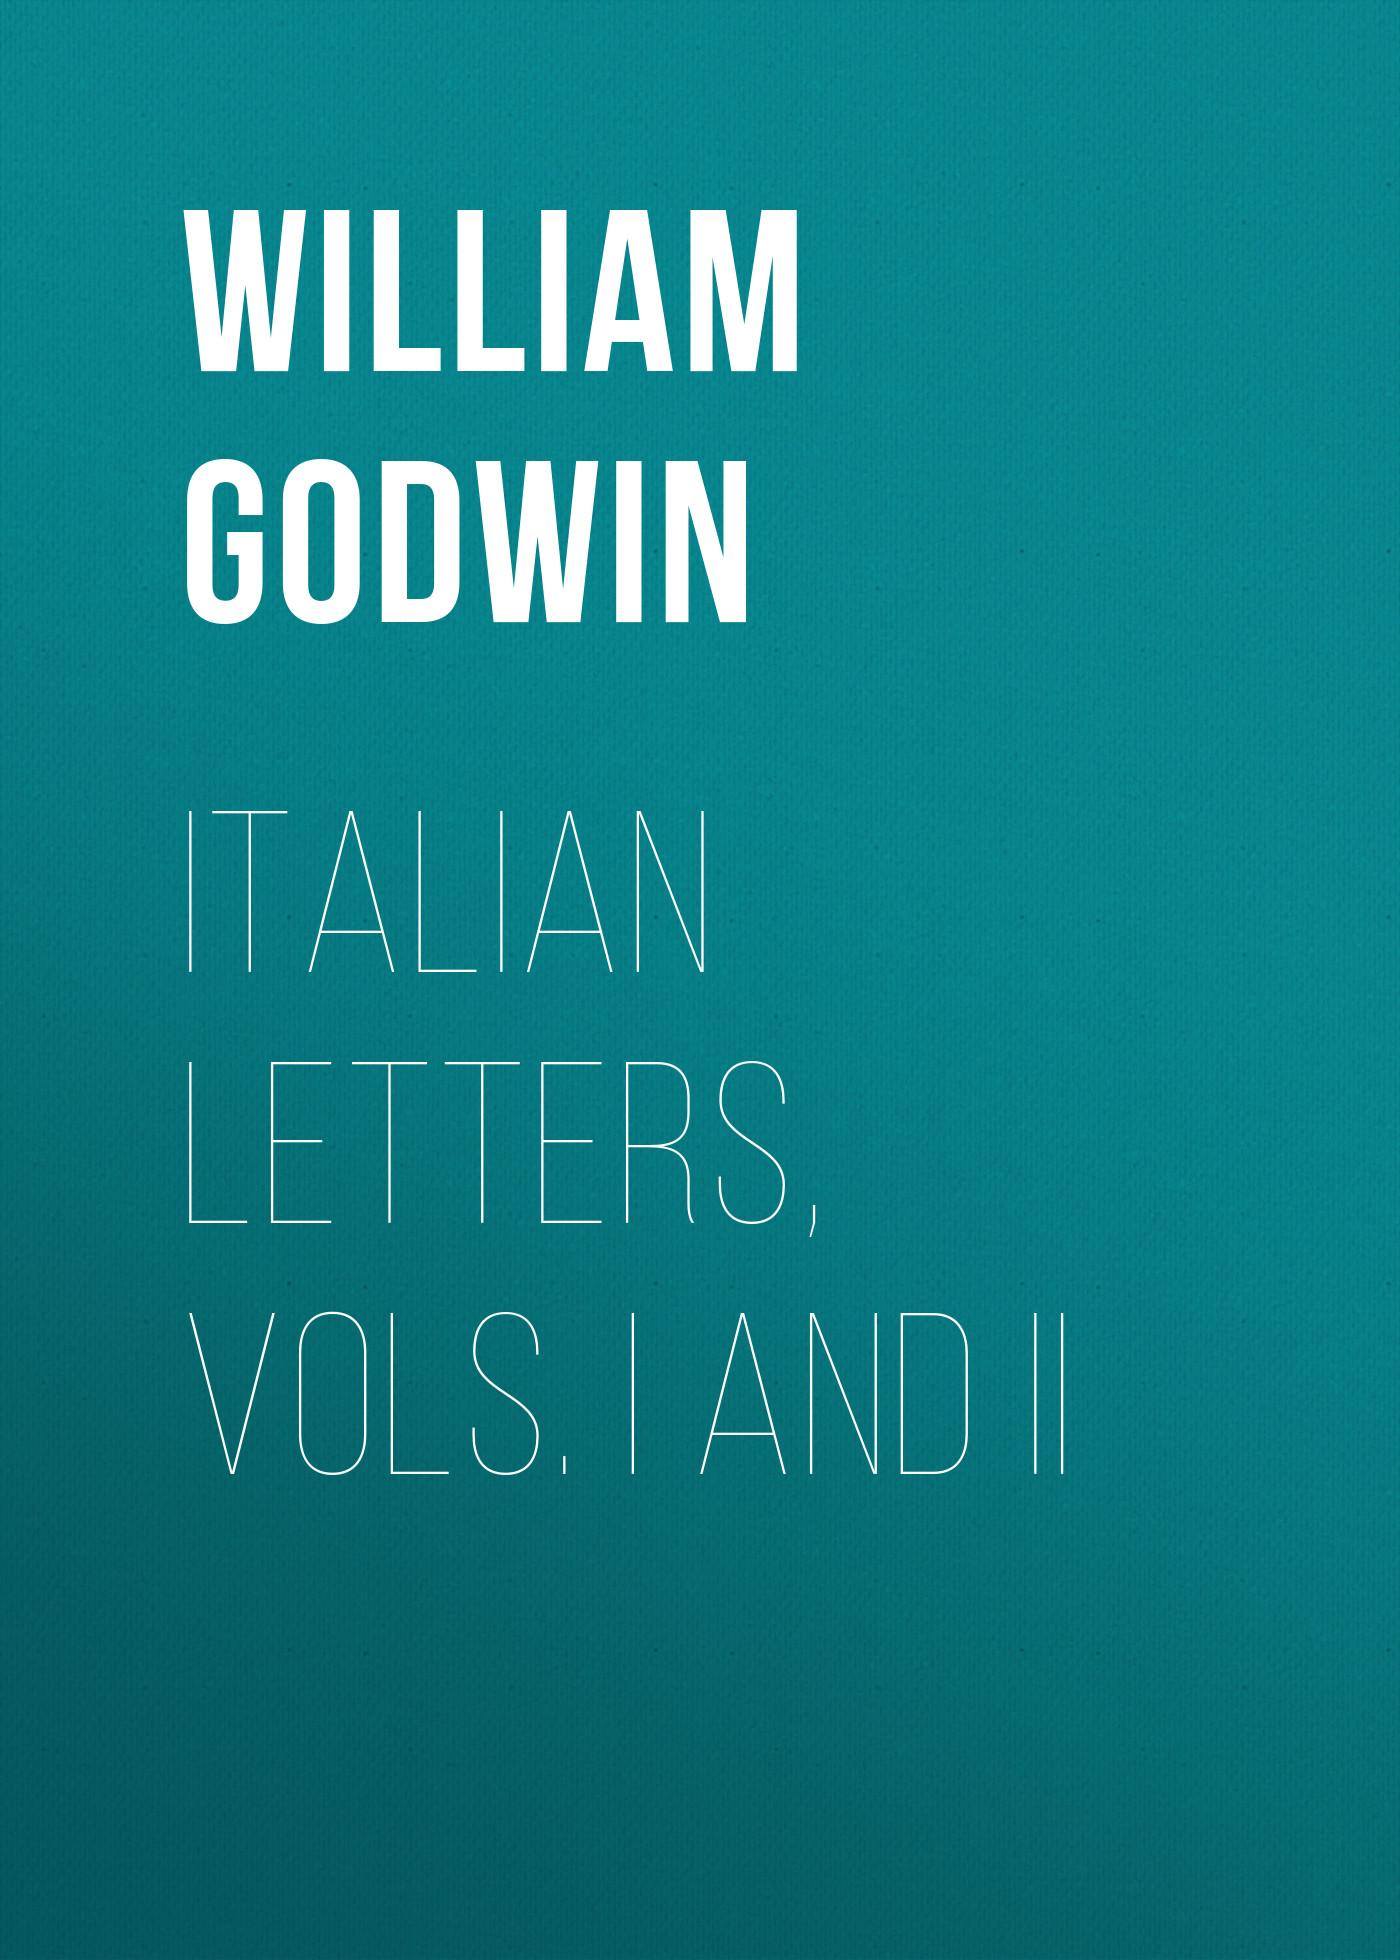 William Godwin Italian Letters, Vols. I and II william godwin italian letters vols i and ii